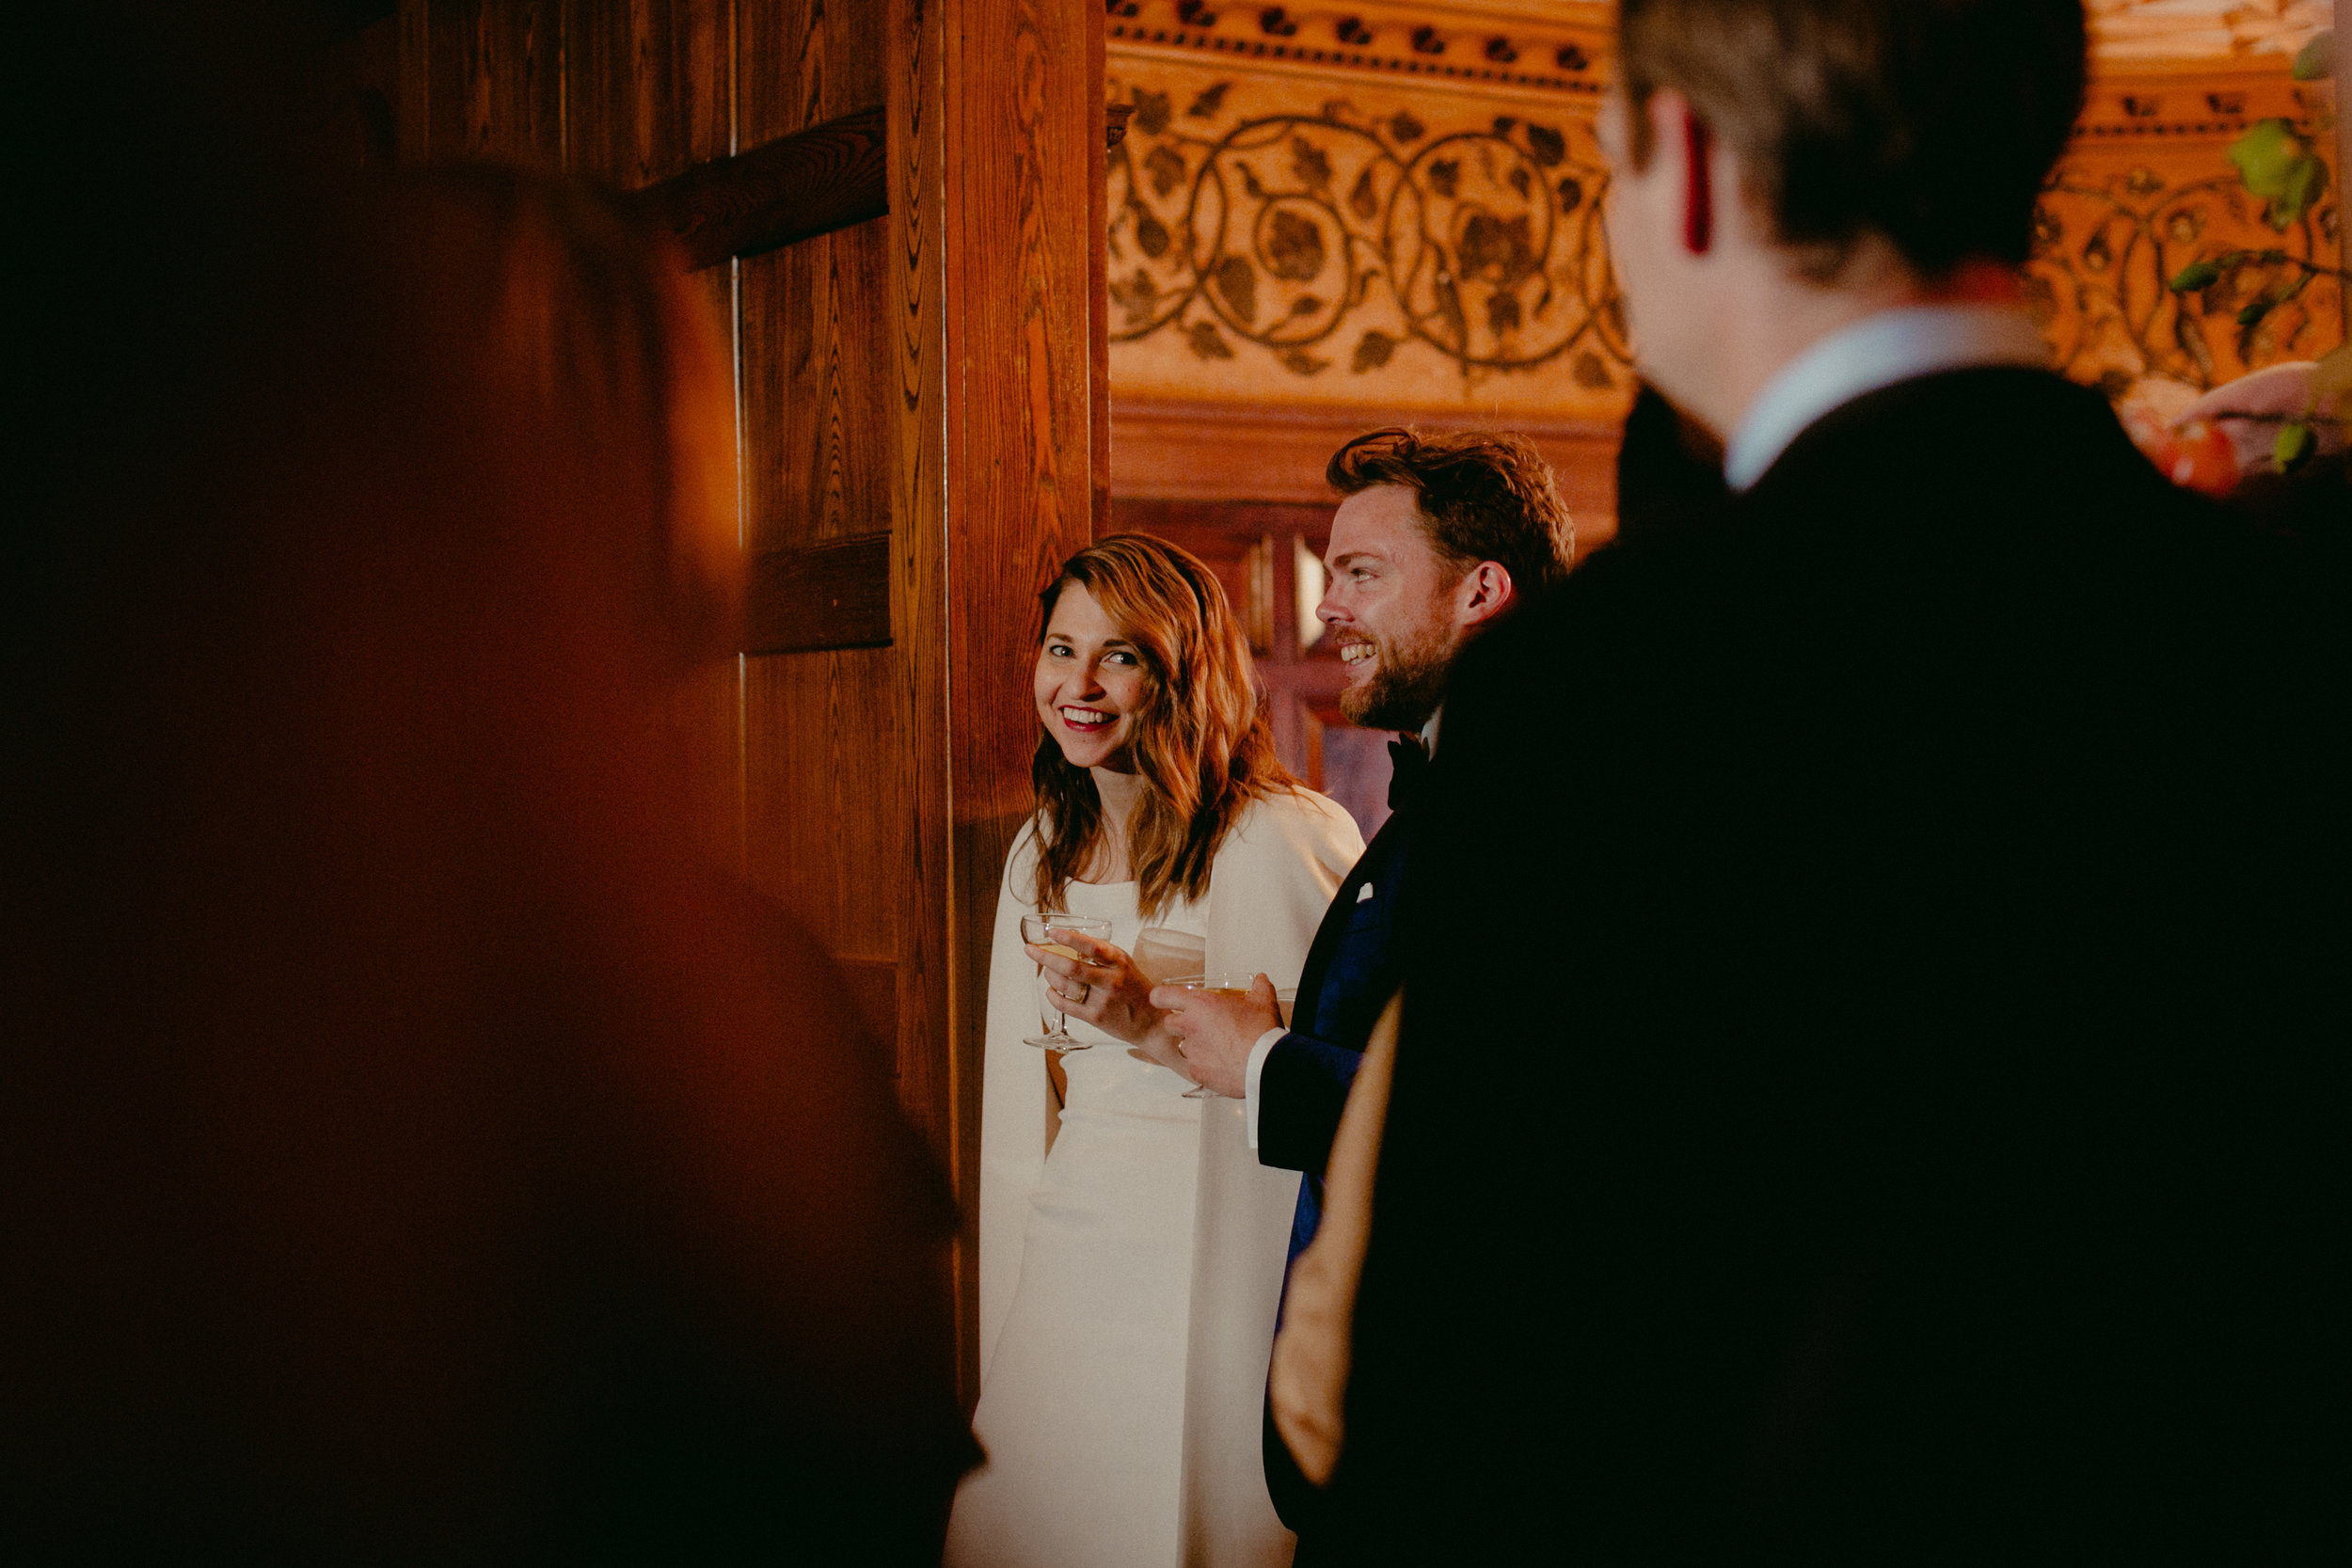 Tiger_House_The_Inn_at_Hudson-Wedding_Chellise_Michael_Photography-374.jpg